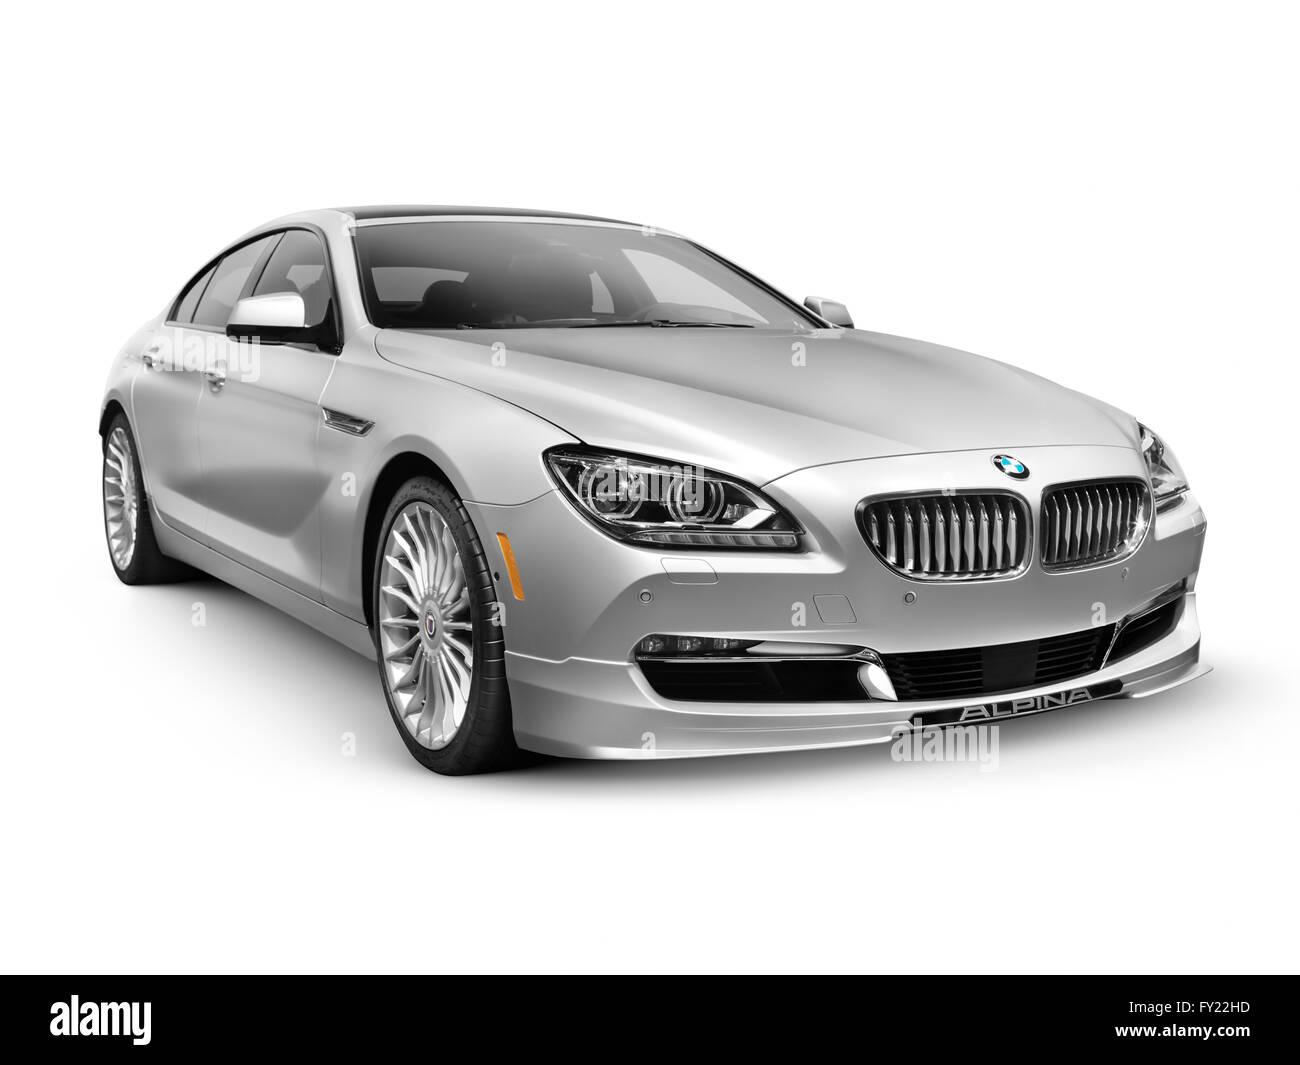 Silver 2015 BMW Alpina B6 Gran Coupe luxury car - Stock Image